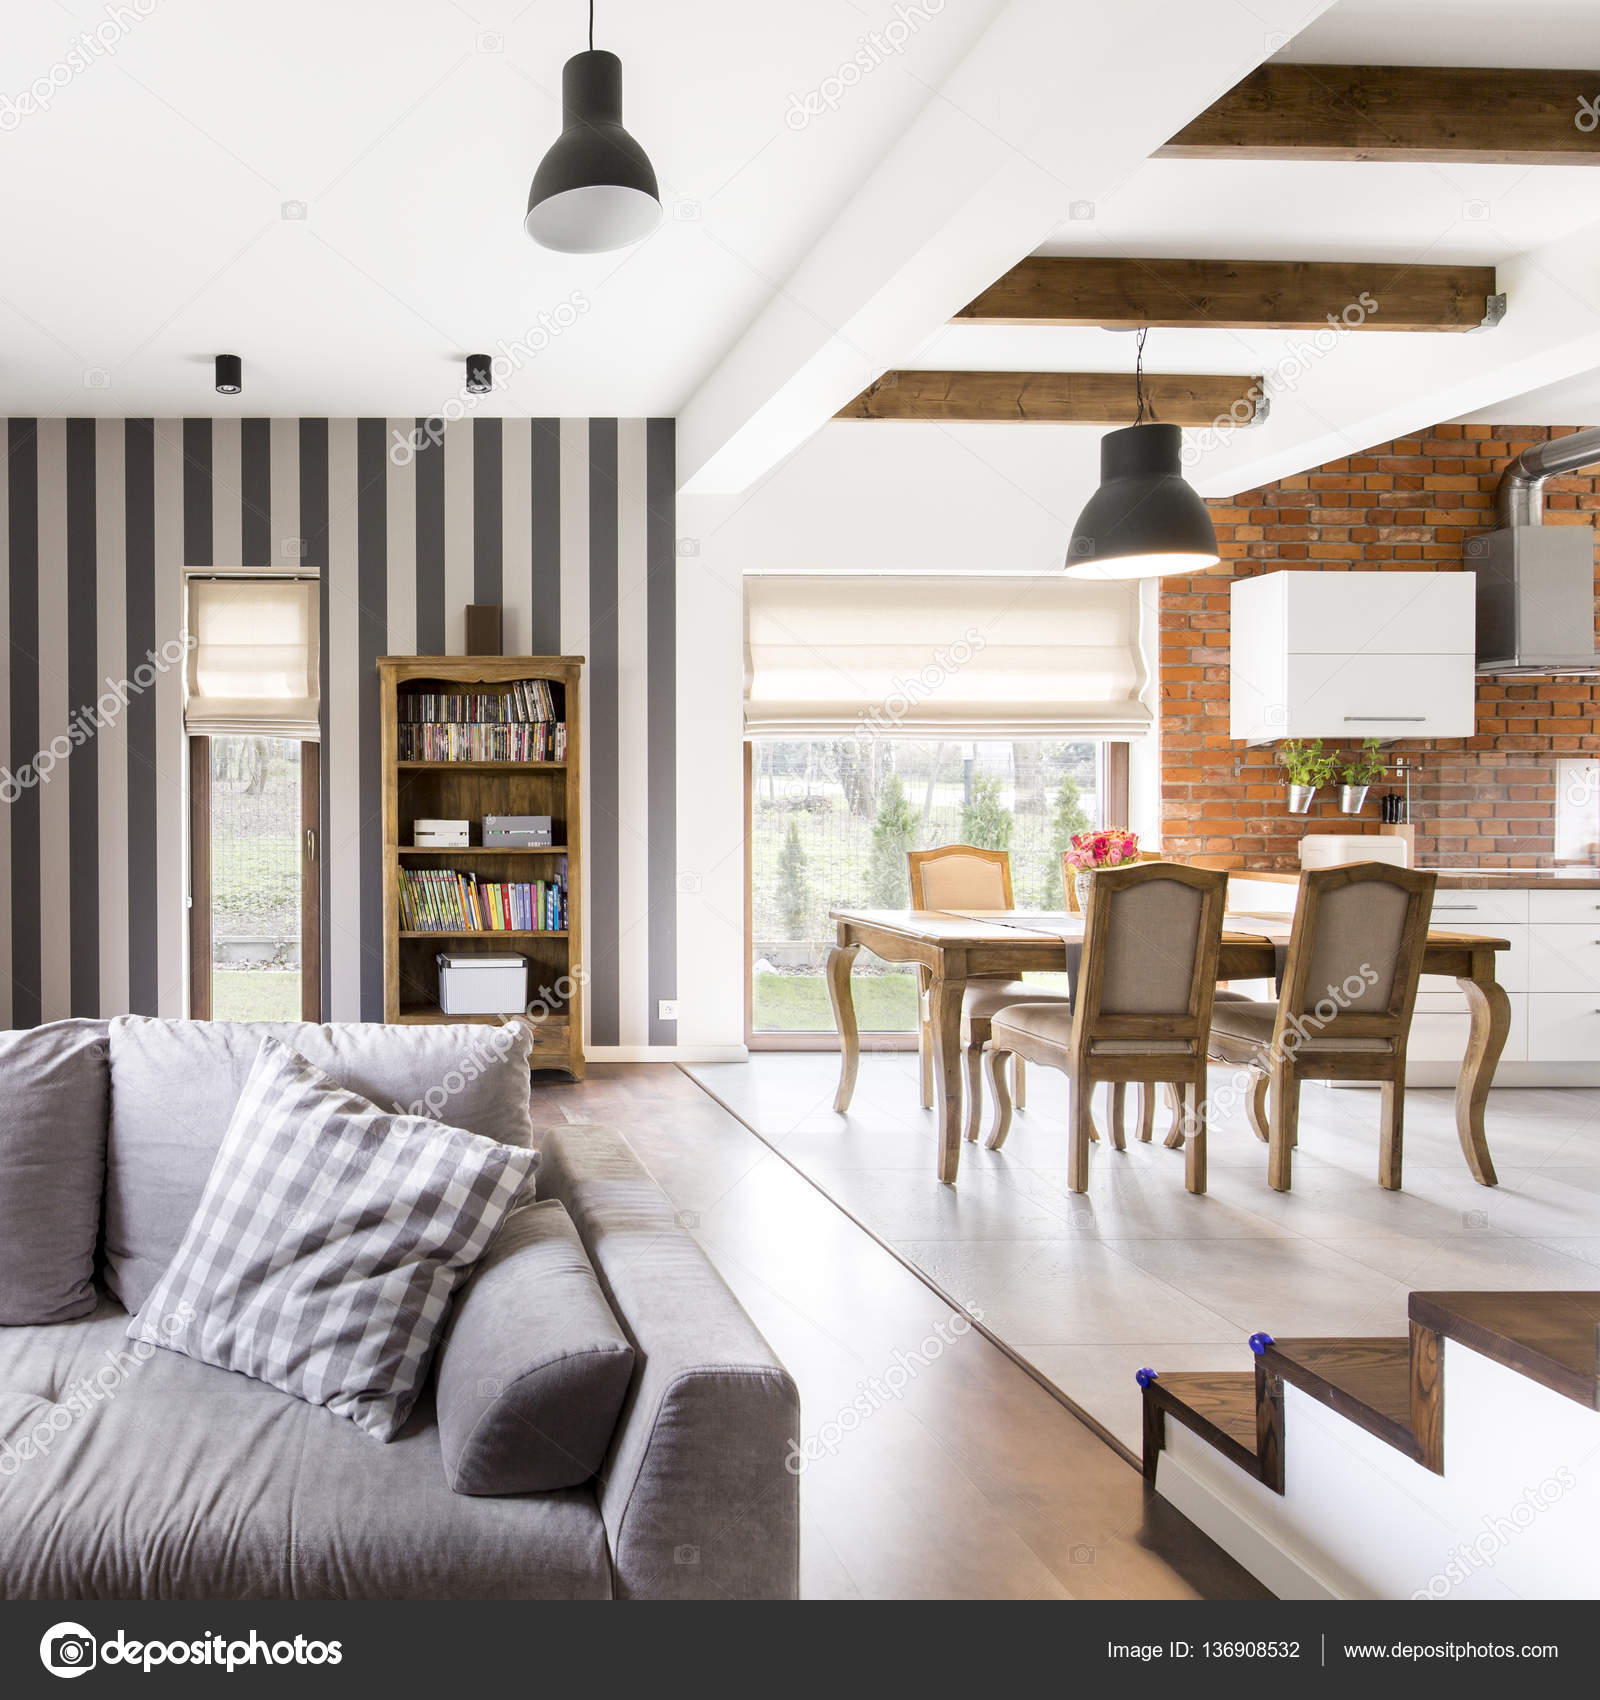 https://st3.depositphotos.com/2249091/13690/i/1600/depositphotos_136908532-stockafbeelding-glamour-interieur-met-vintage-meubels.jpg